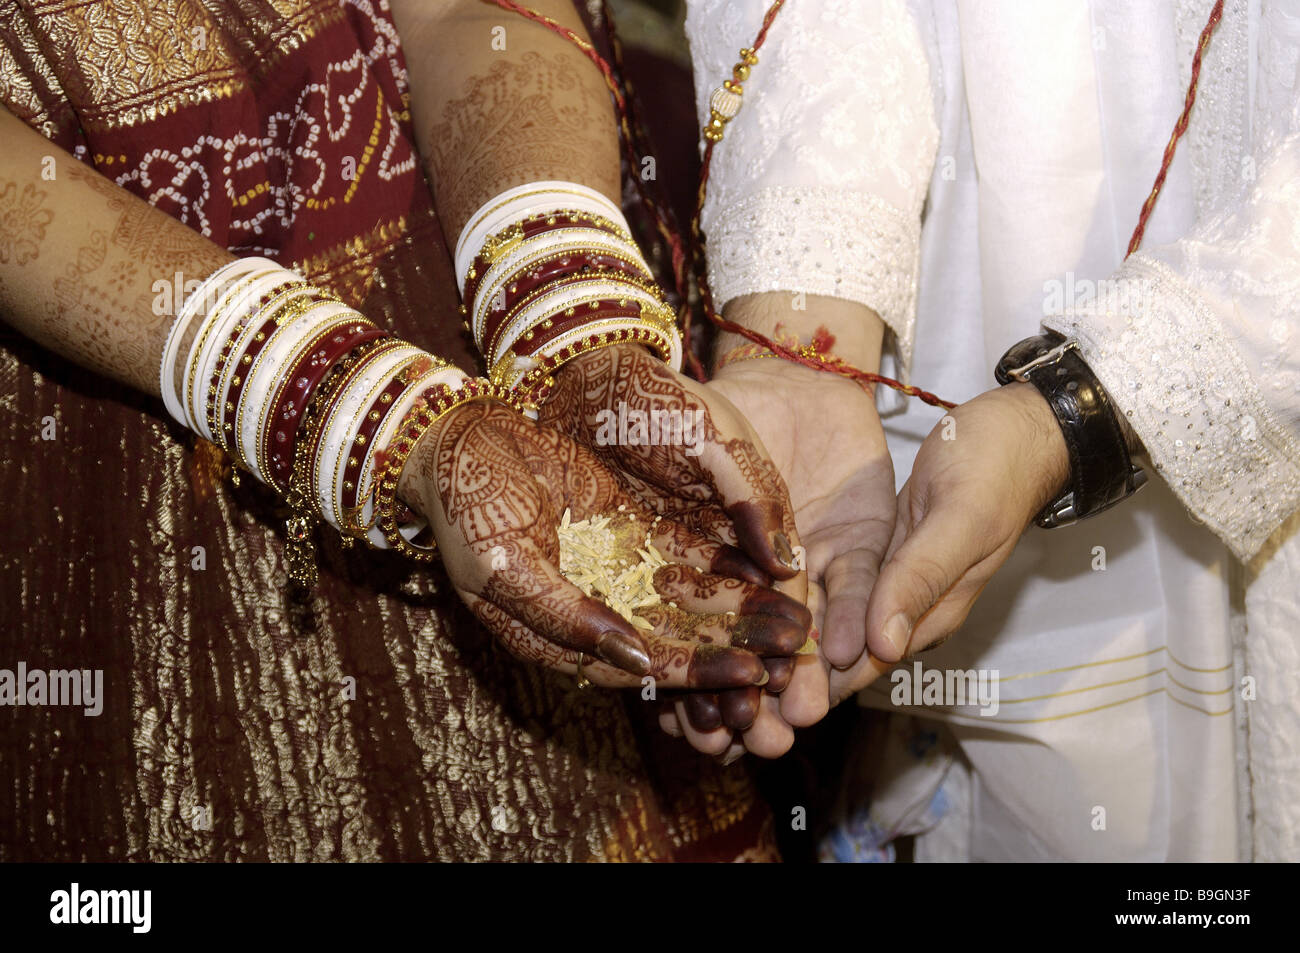 Mehndi Hands Couple : Patterns of mehndi stock photos images